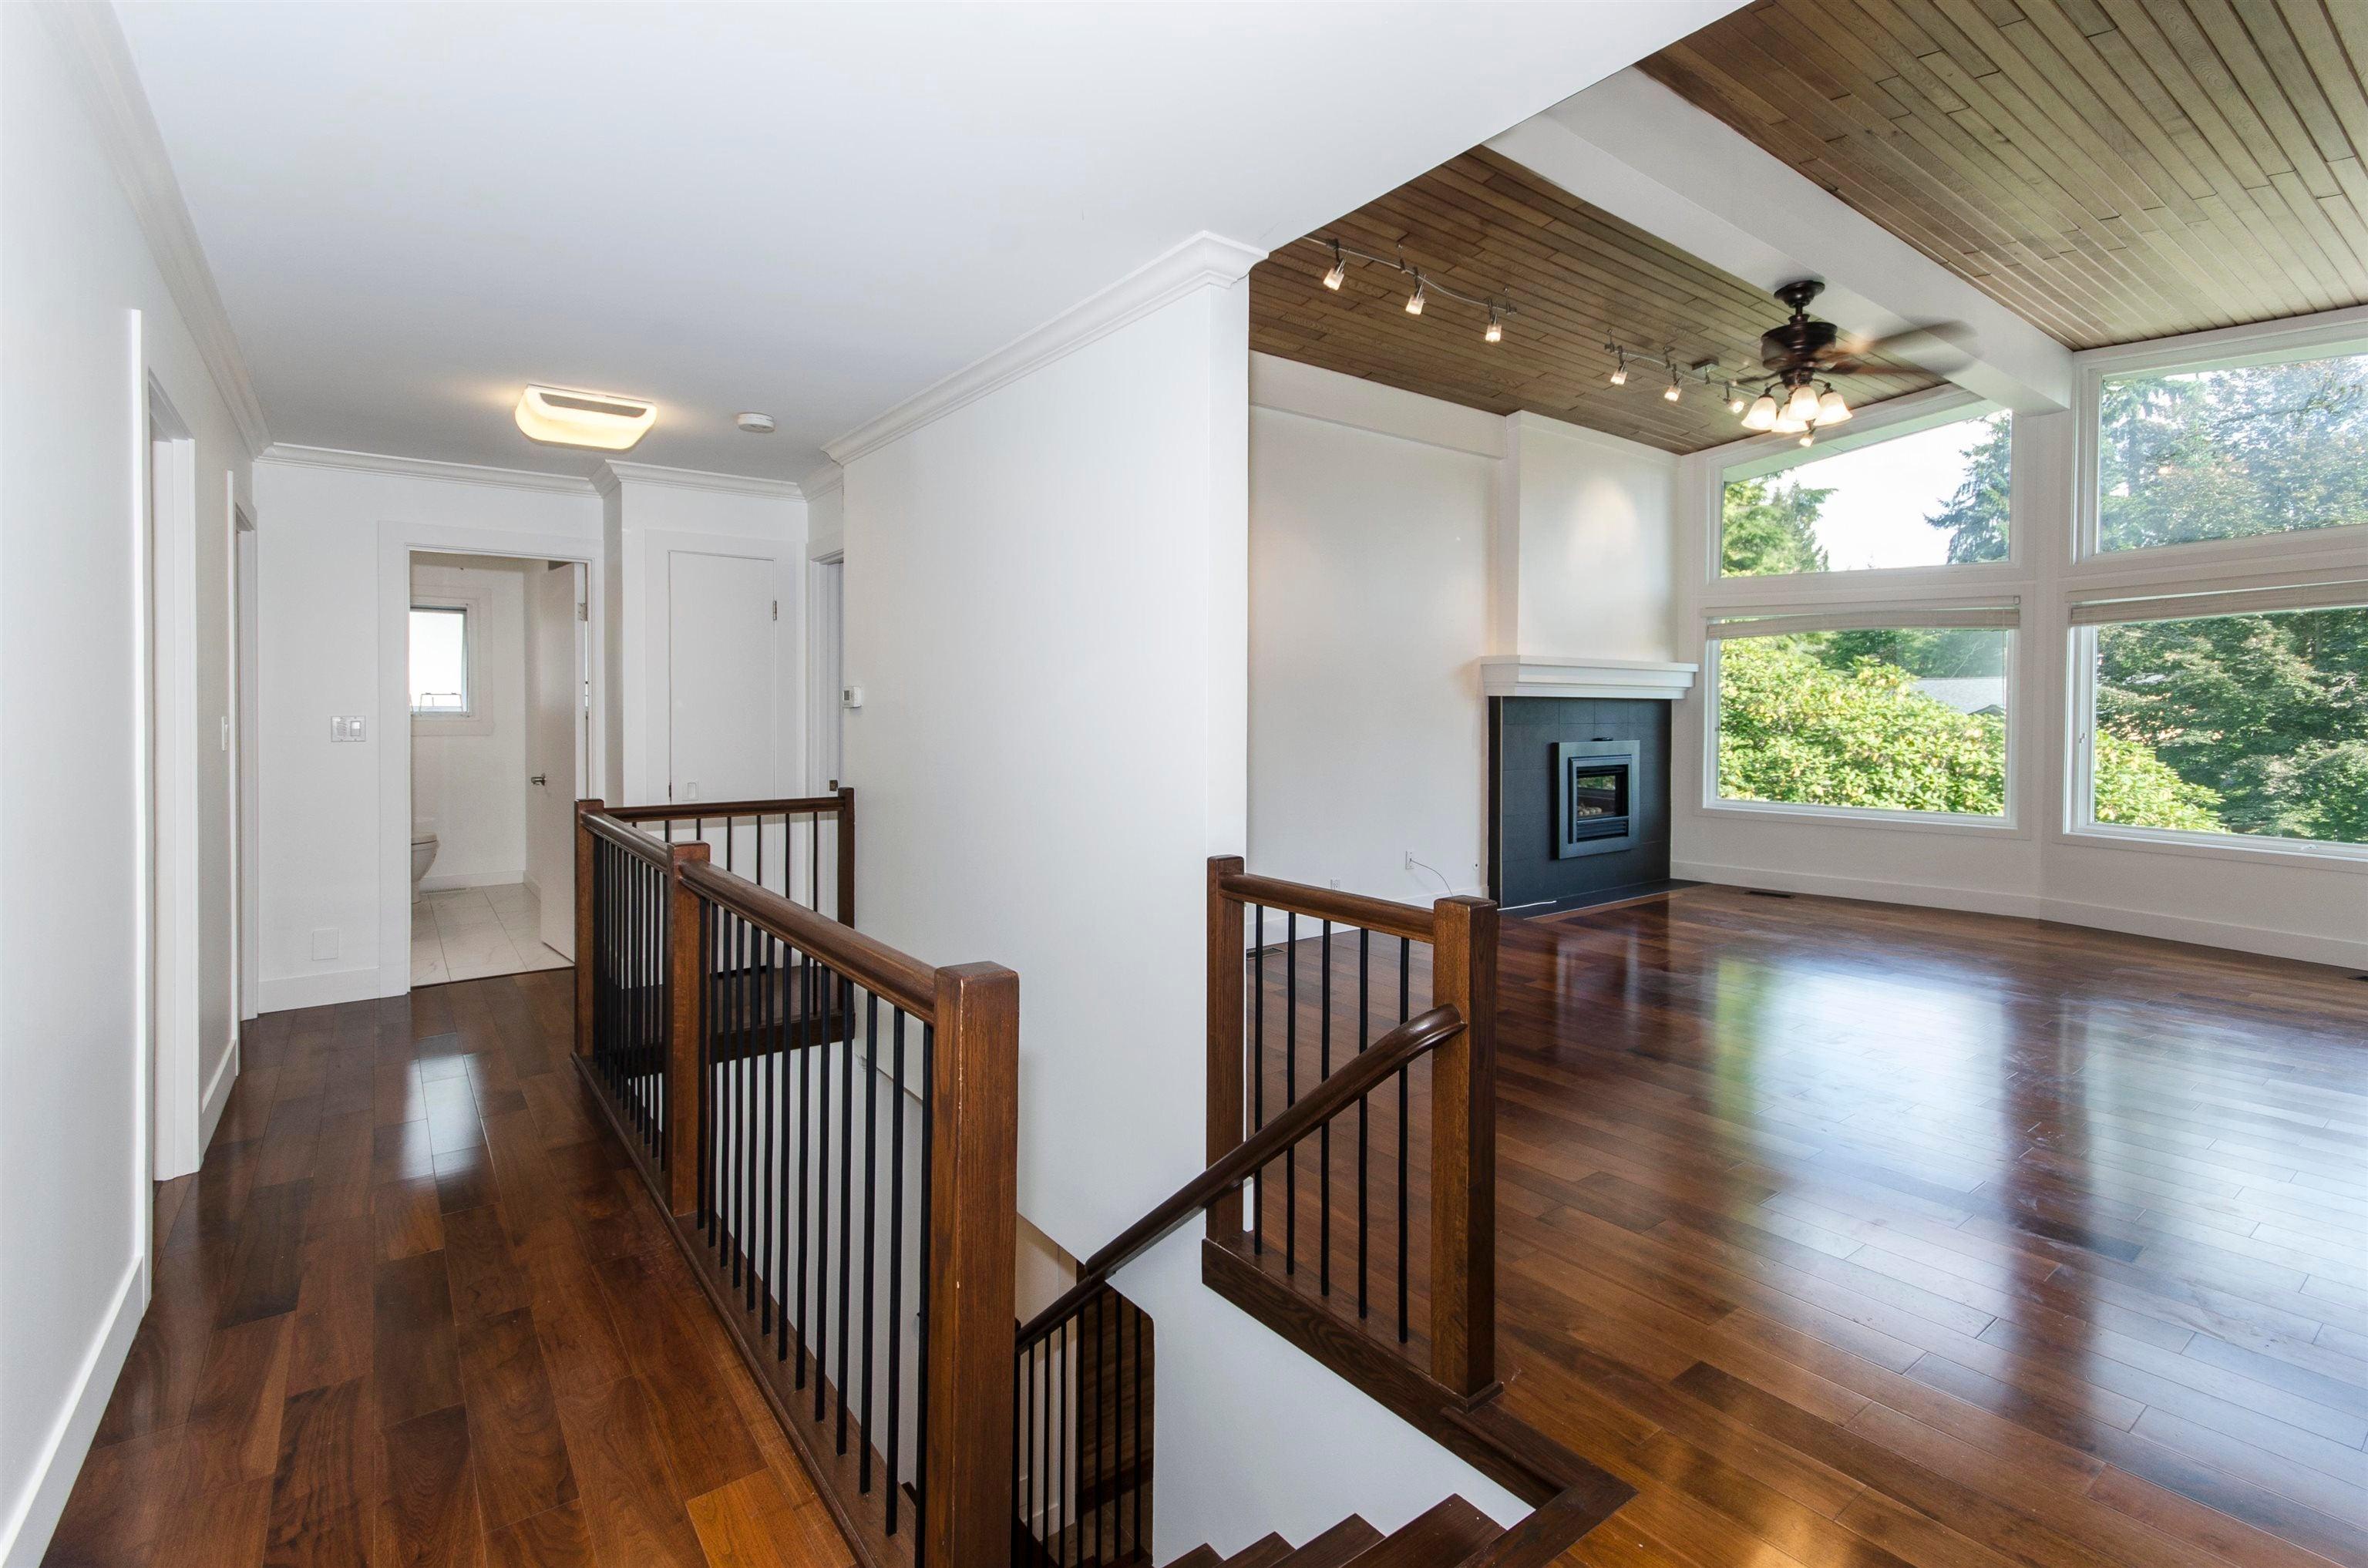 3785 REGENT AVENUE - Upper Lonsdale House/Single Family for sale, 4 Bedrooms (R2617648) - #11